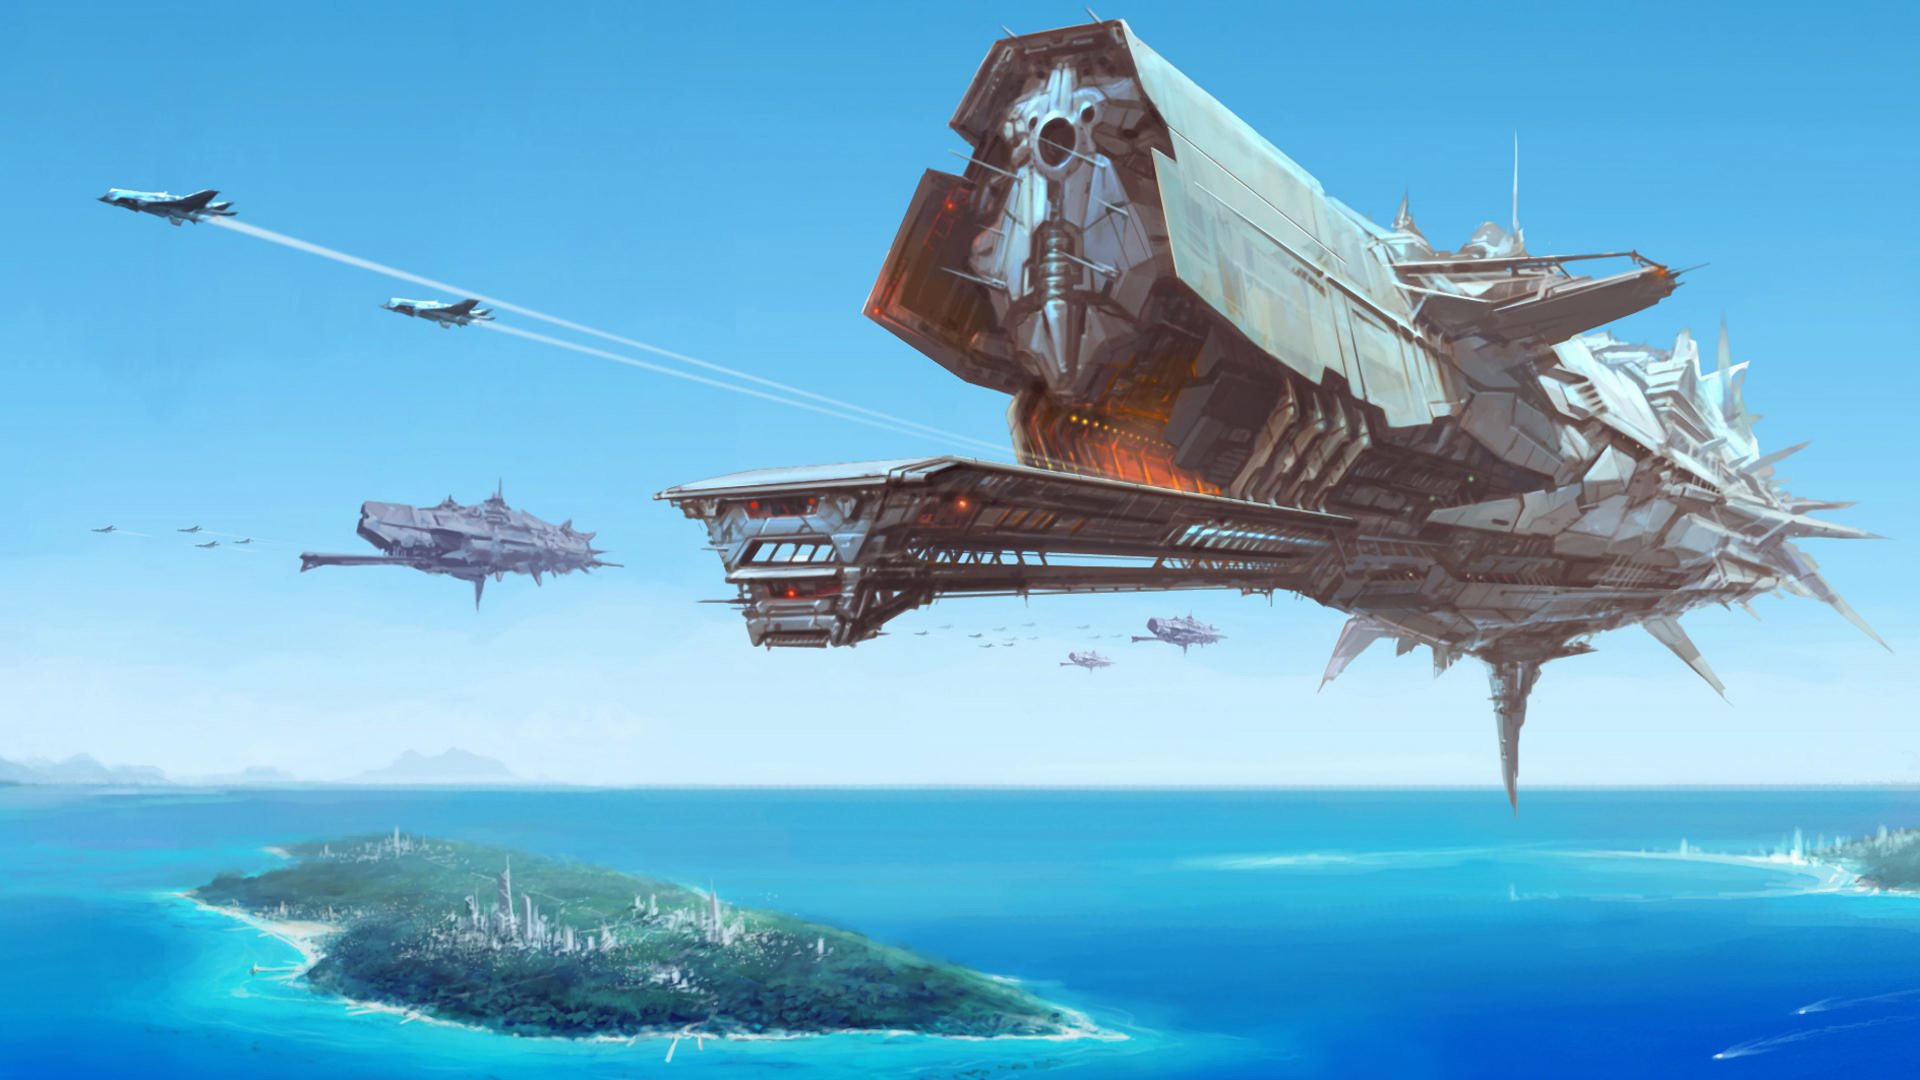 Sci-Fi Battle Space Ship Wallpaper